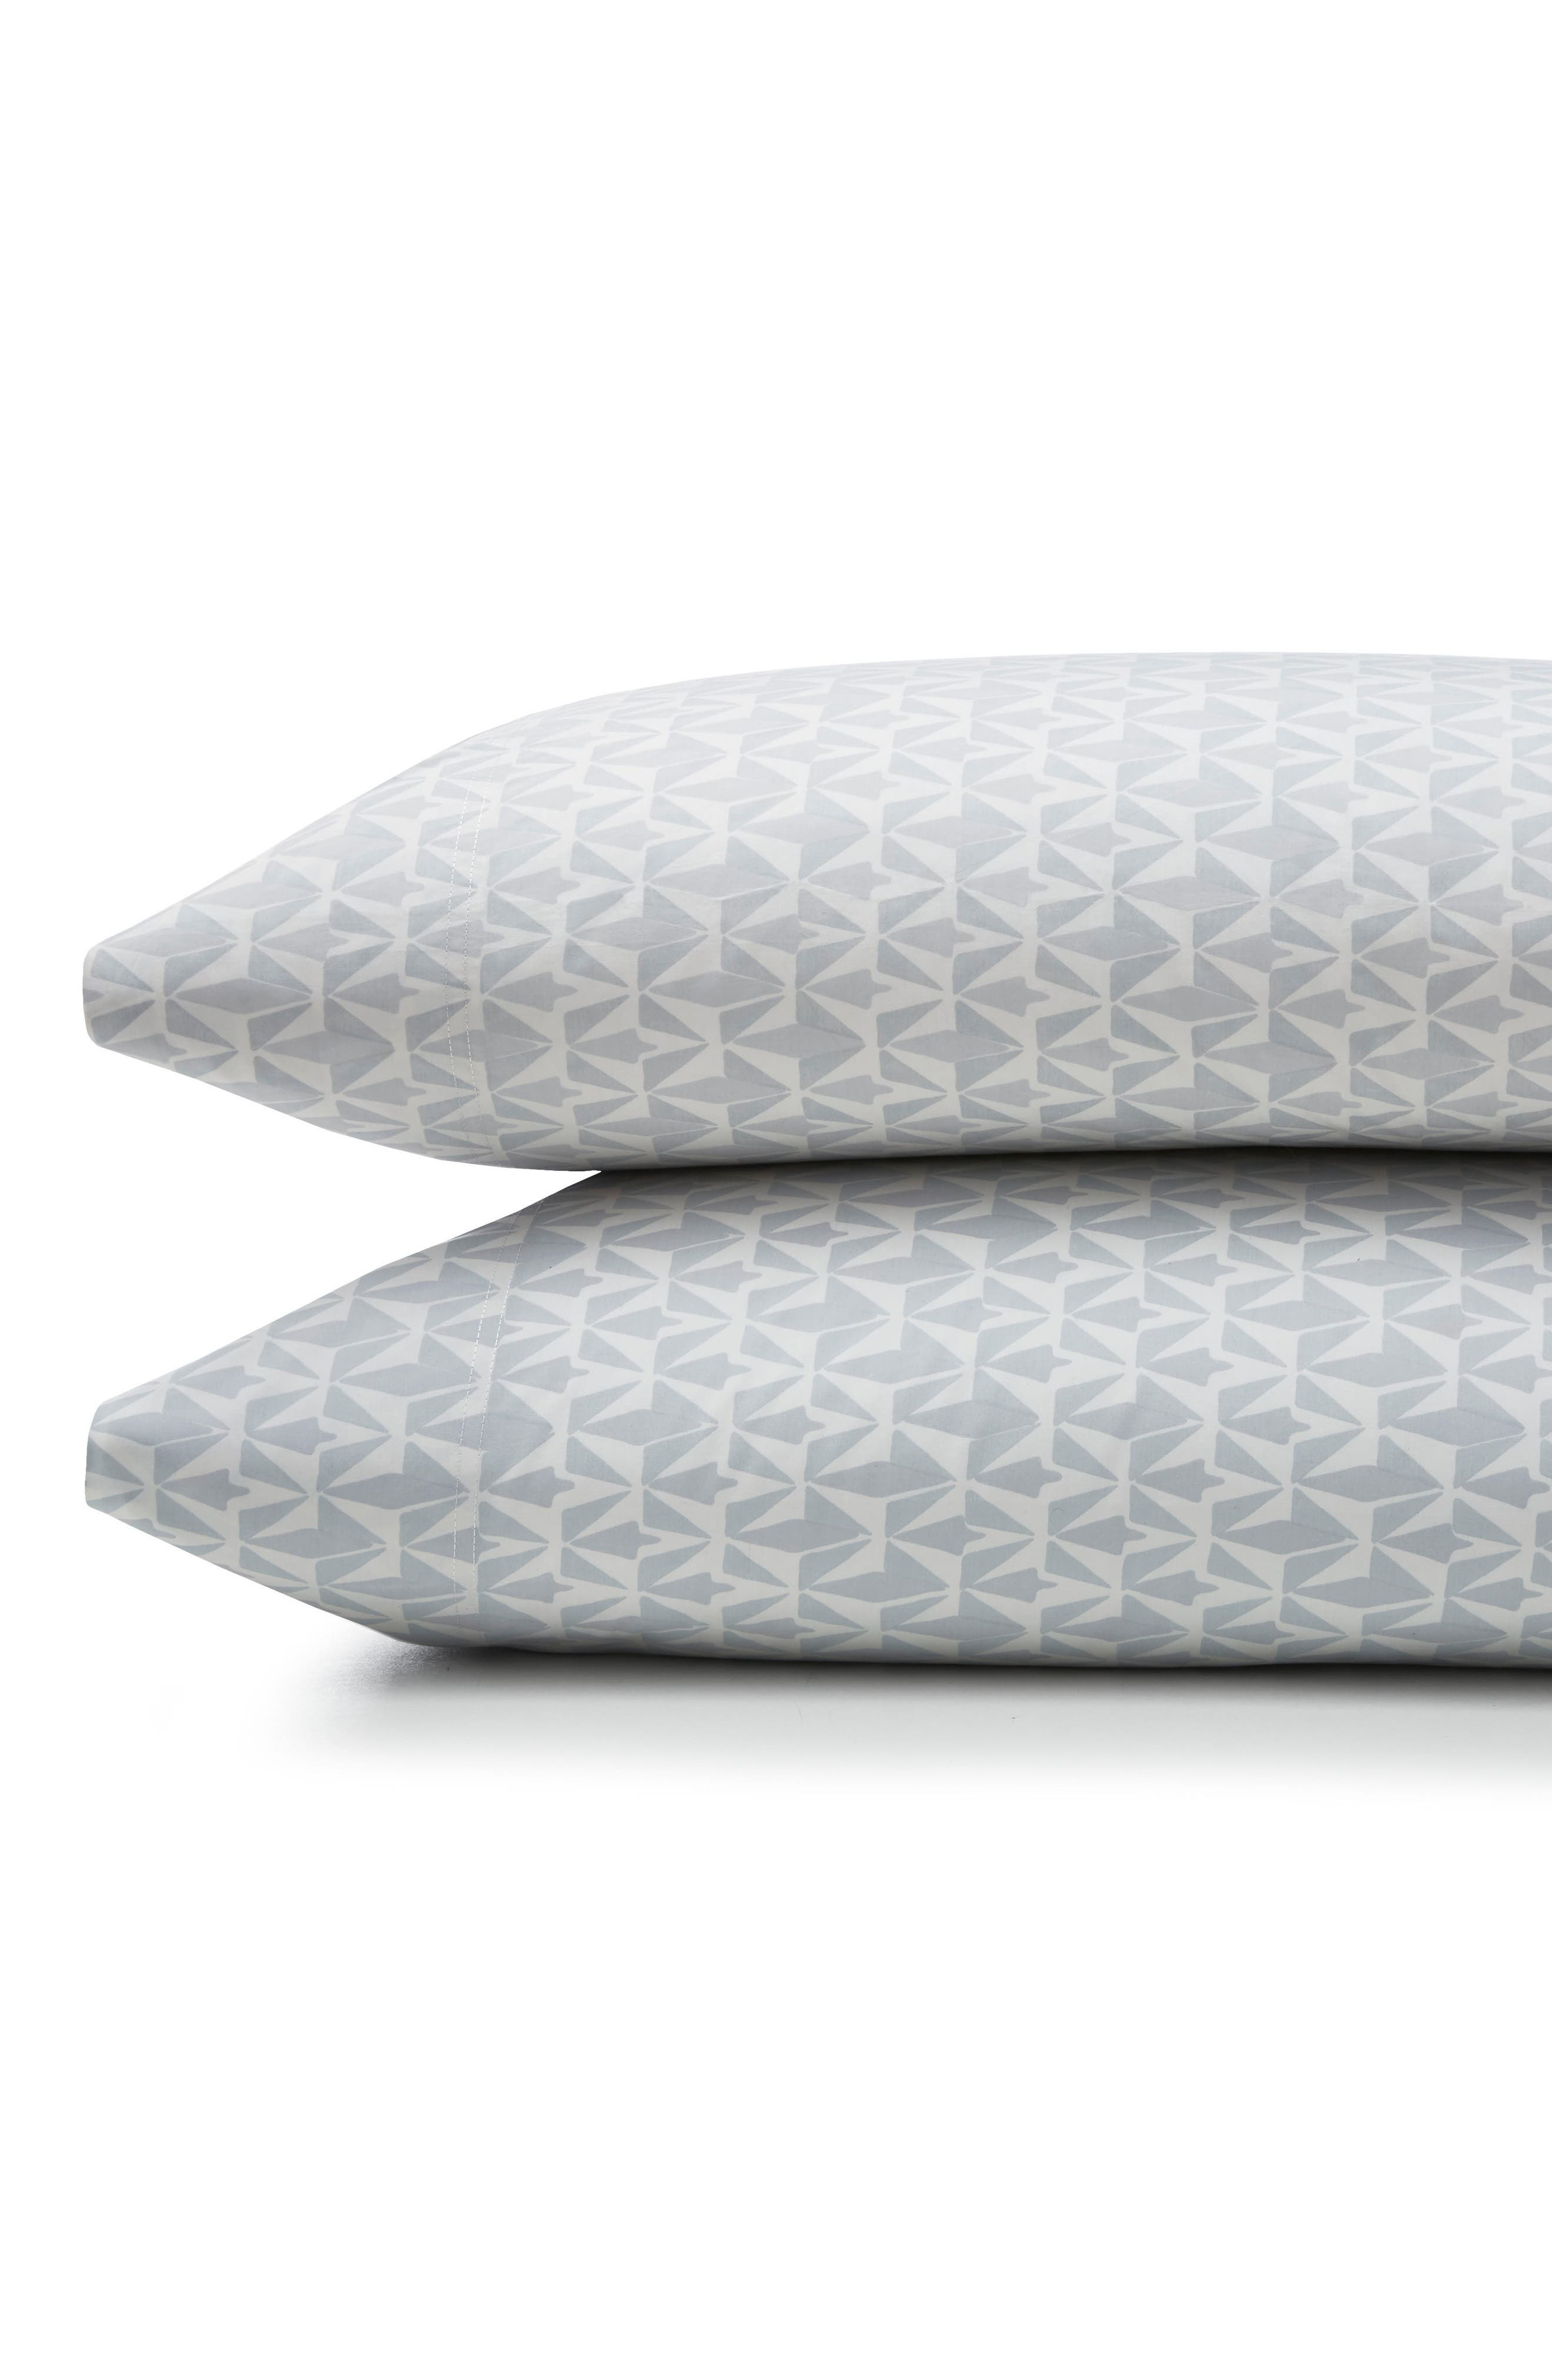 Grasslands 300 Thread Count Pair of Pillowcases,                             Main thumbnail 1, color,                             Nibus/ Light/ Pastel Grey